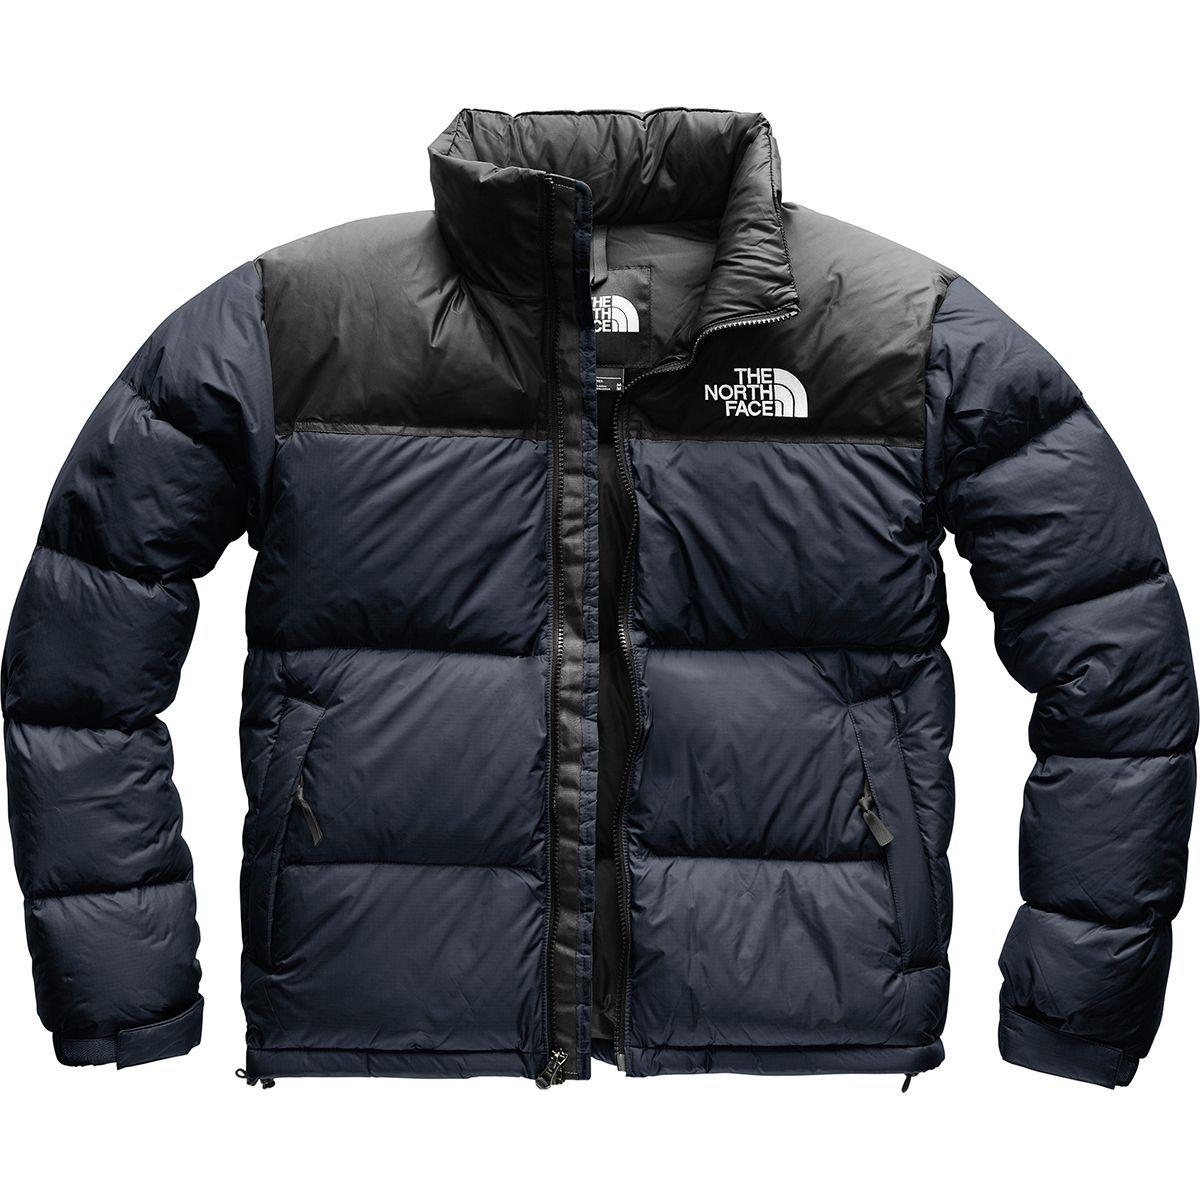 1996 Retro Nuptse Jacket Men S North Face Puffer Jacket North Face Mens North Face Nuptse [ 1200 x 1200 Pixel ]